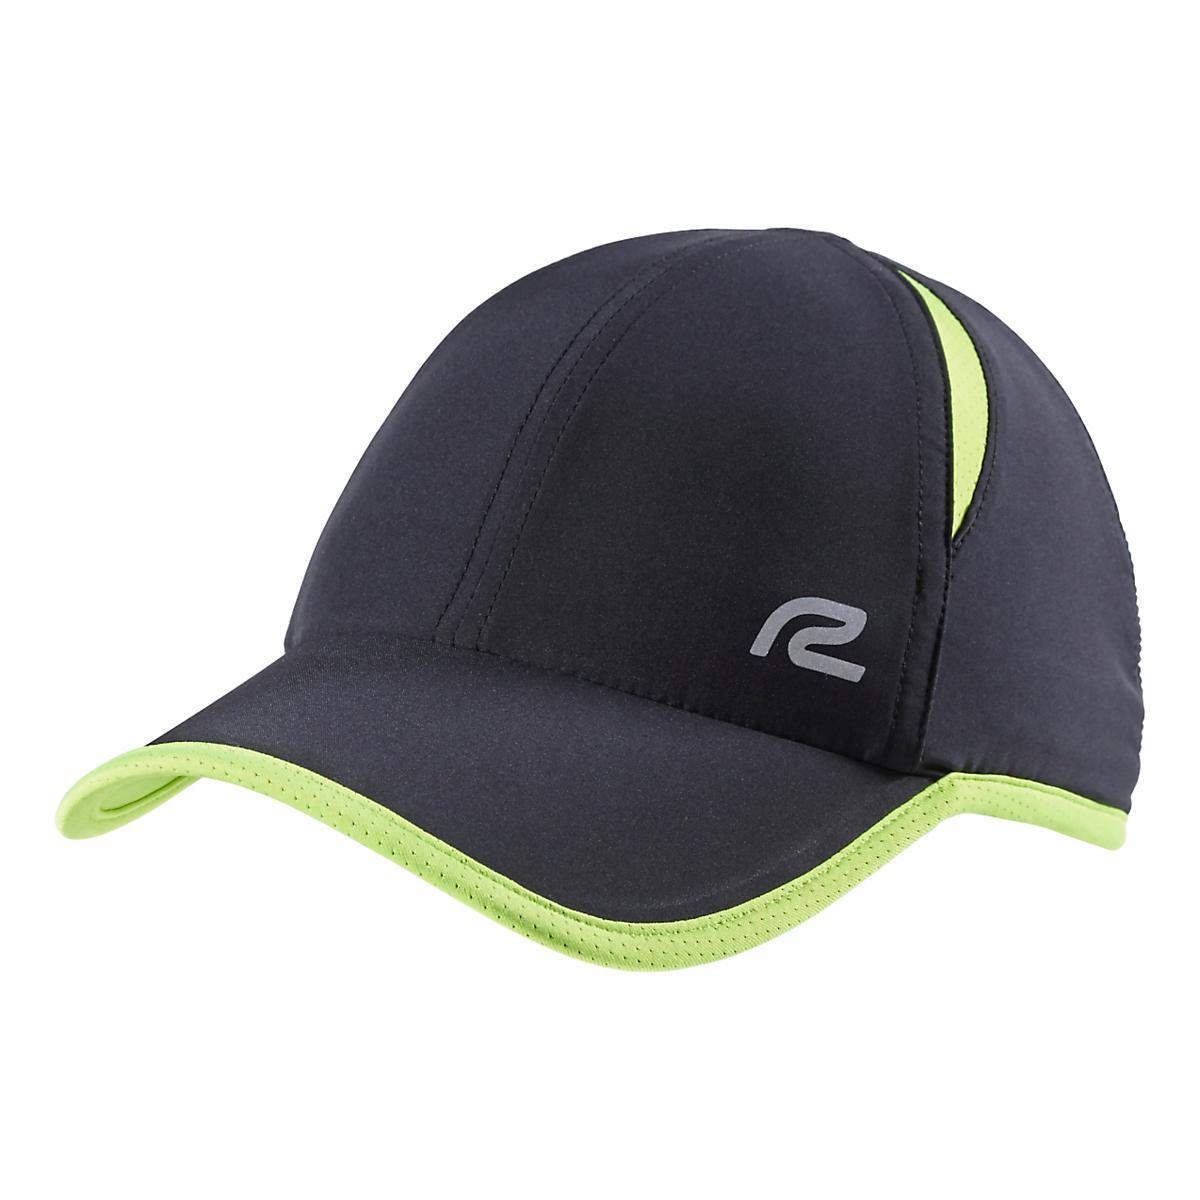 e33d4140e2d Road Runner Sports Put A Lid On It Cap Headwear at Road Runner Sports